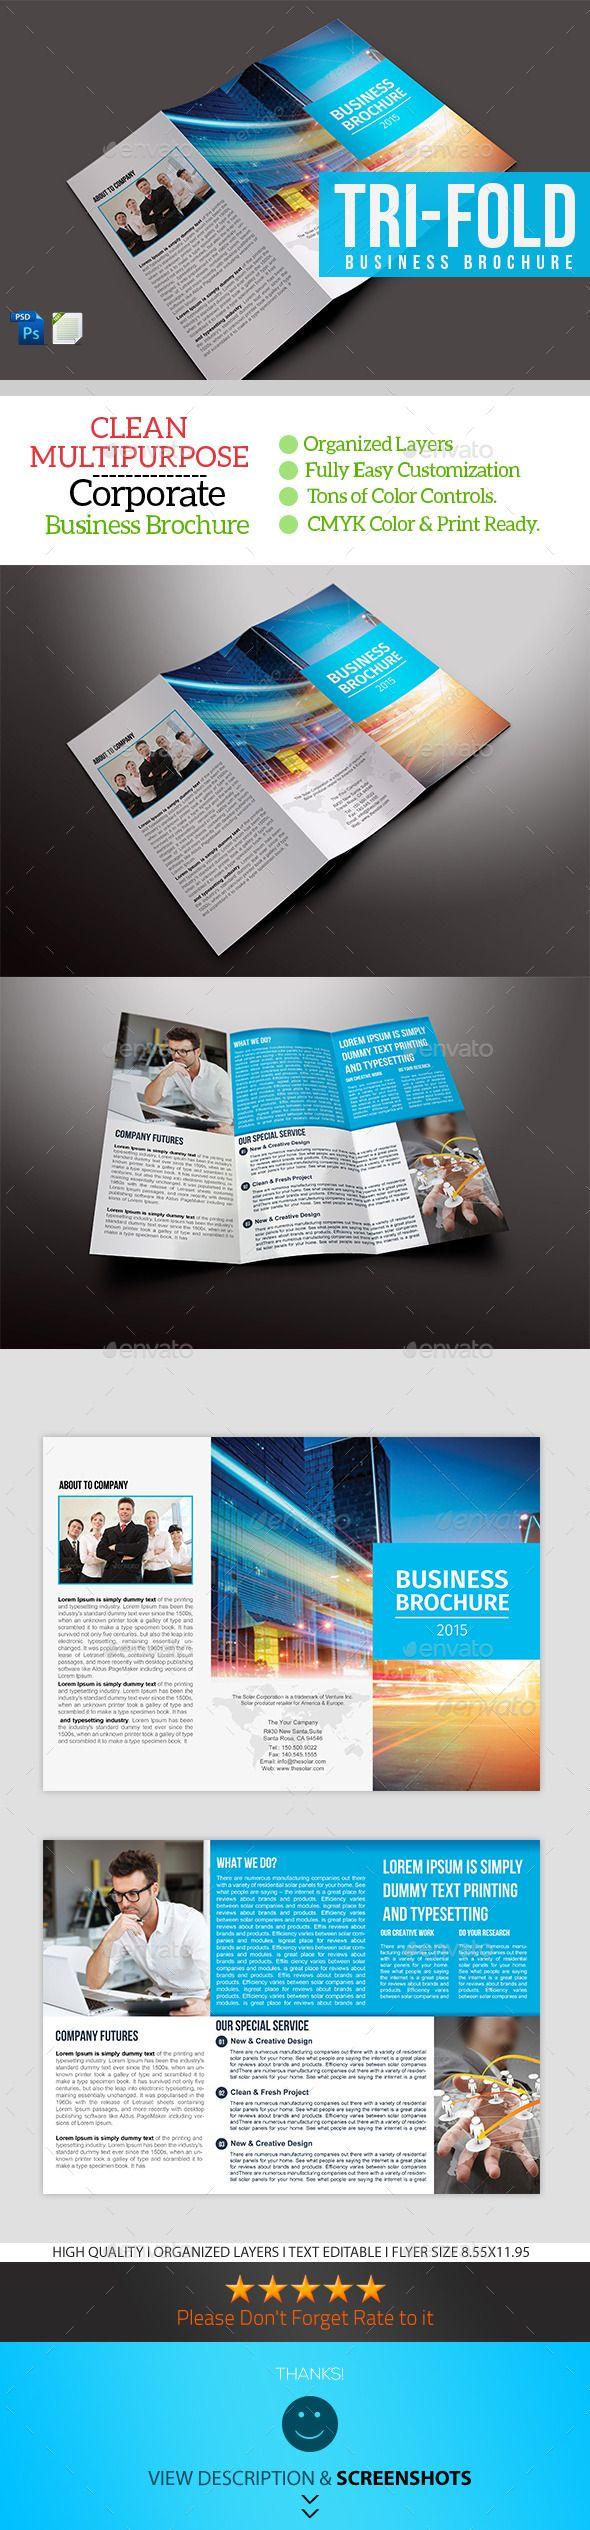 Best Trifold Brochure Template PSD Images On Pinterest - Informational brochure template